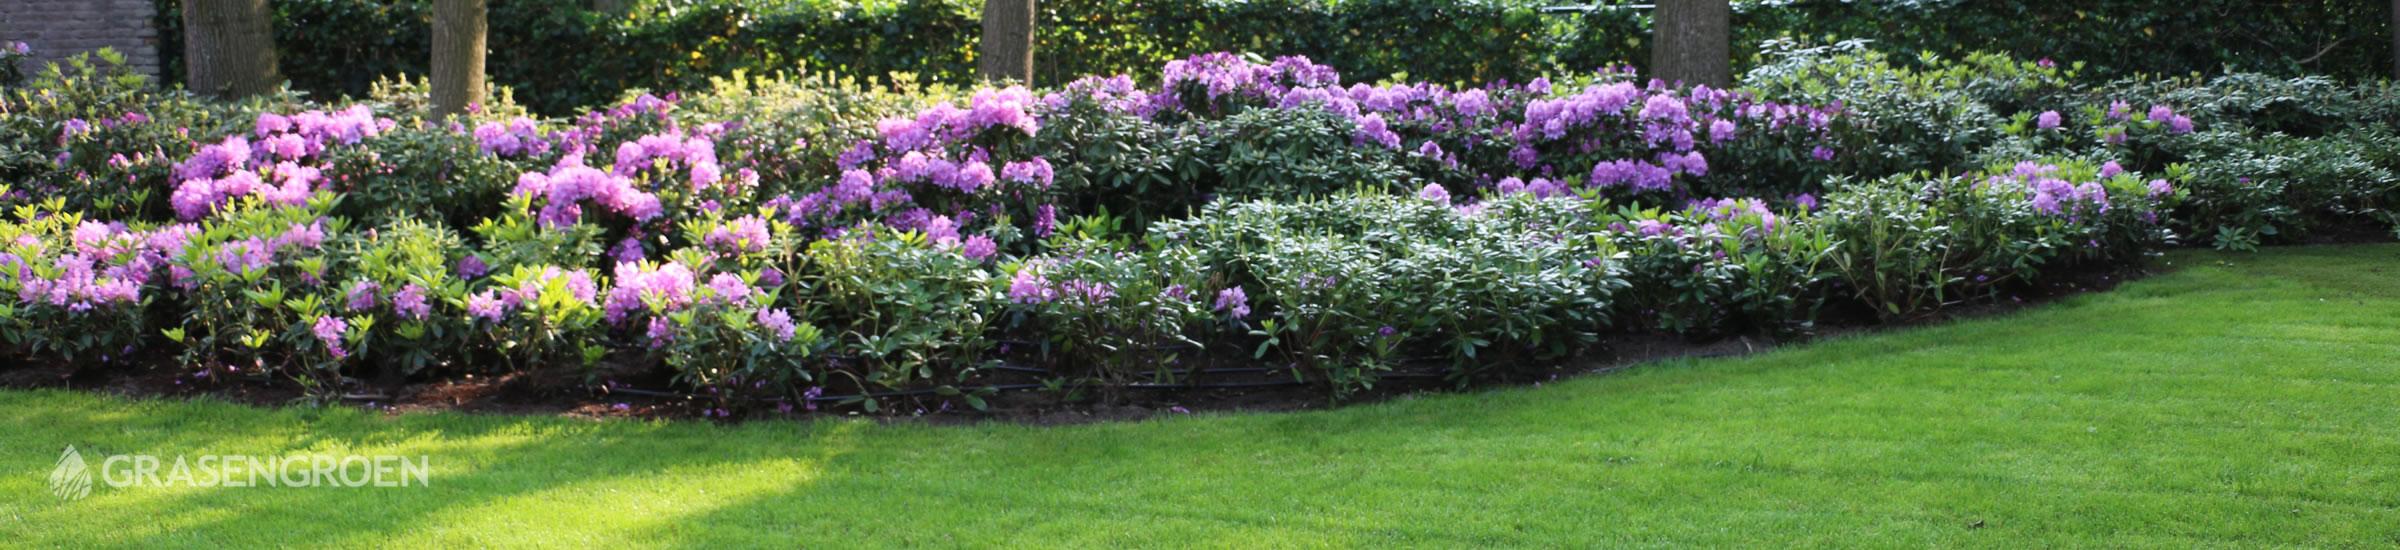 Bostuin • Gras en Groen Winkel